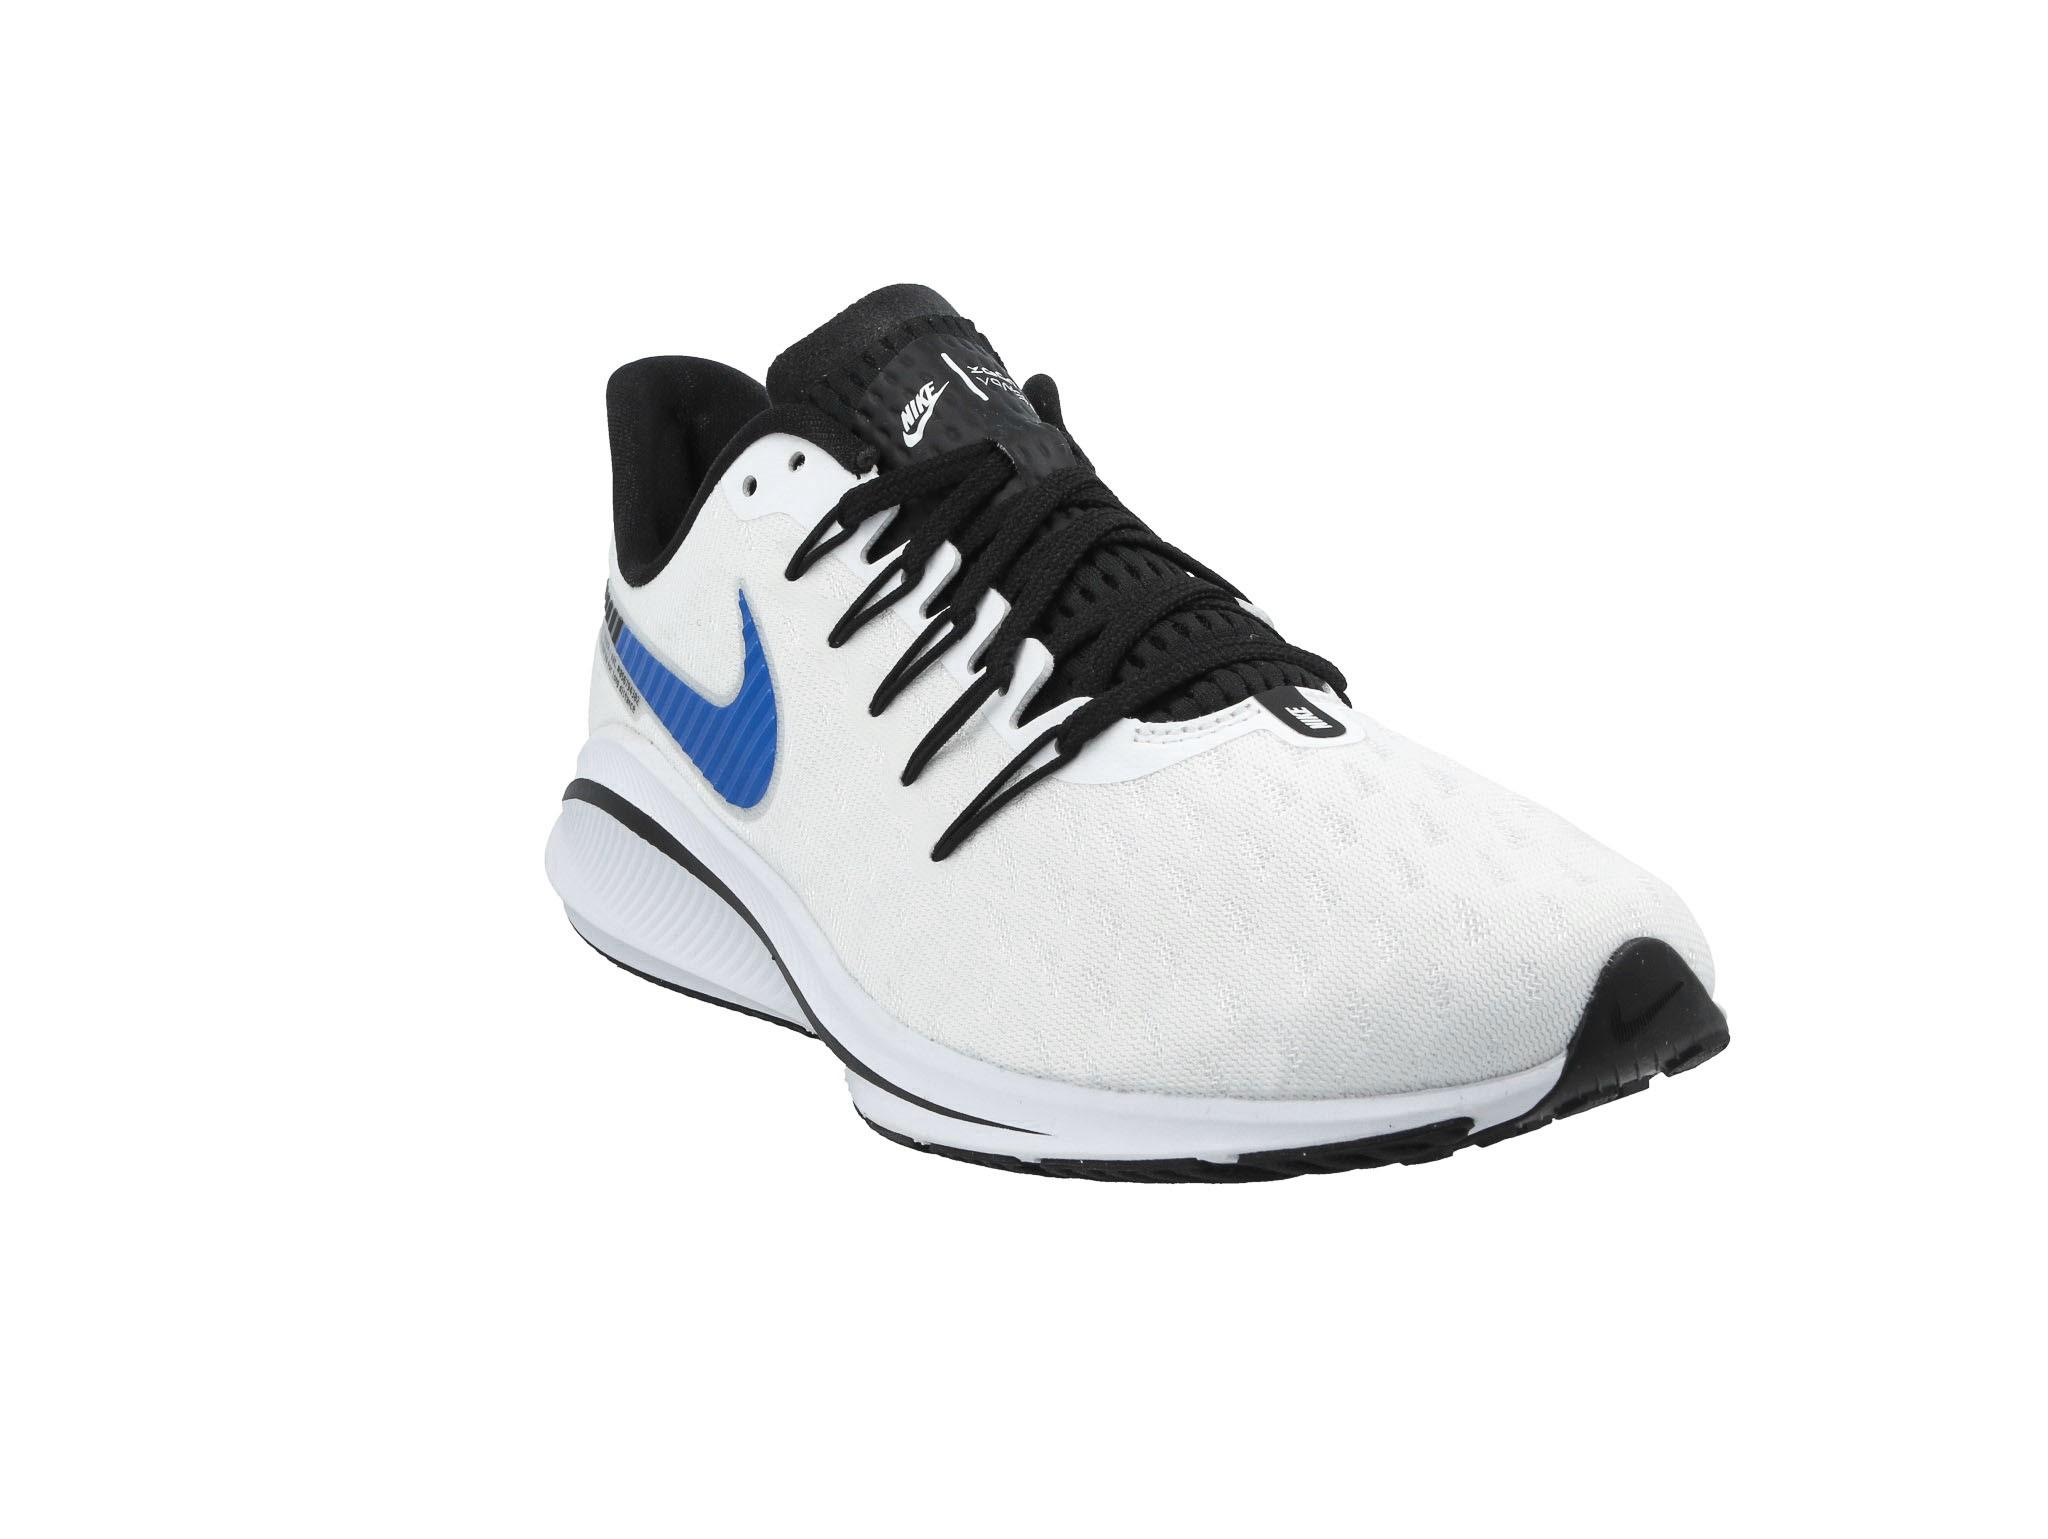 Cipő NIKE Air Zoom Vomero 14 AH7857 101 WhiteRacer BluePlatinum Tint